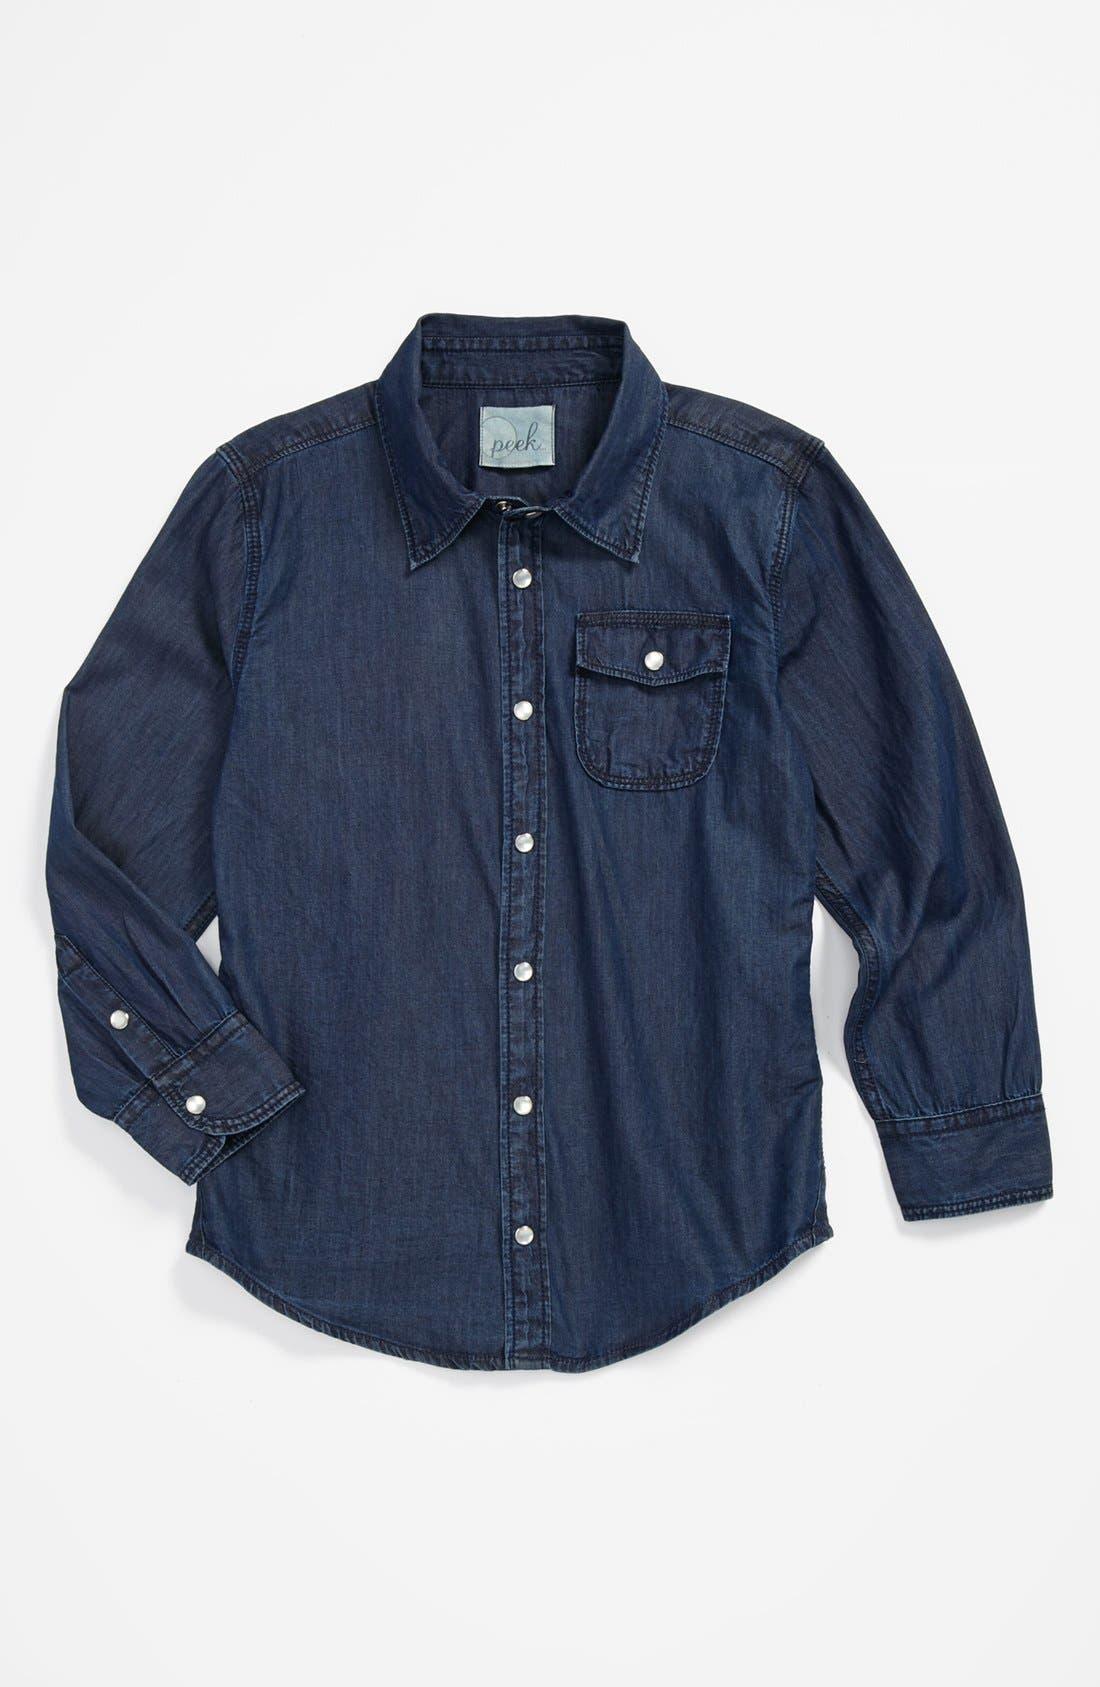 Alternate Image 1 Selected - Peek 'Logan' Chambray Shirt (Big Boys)